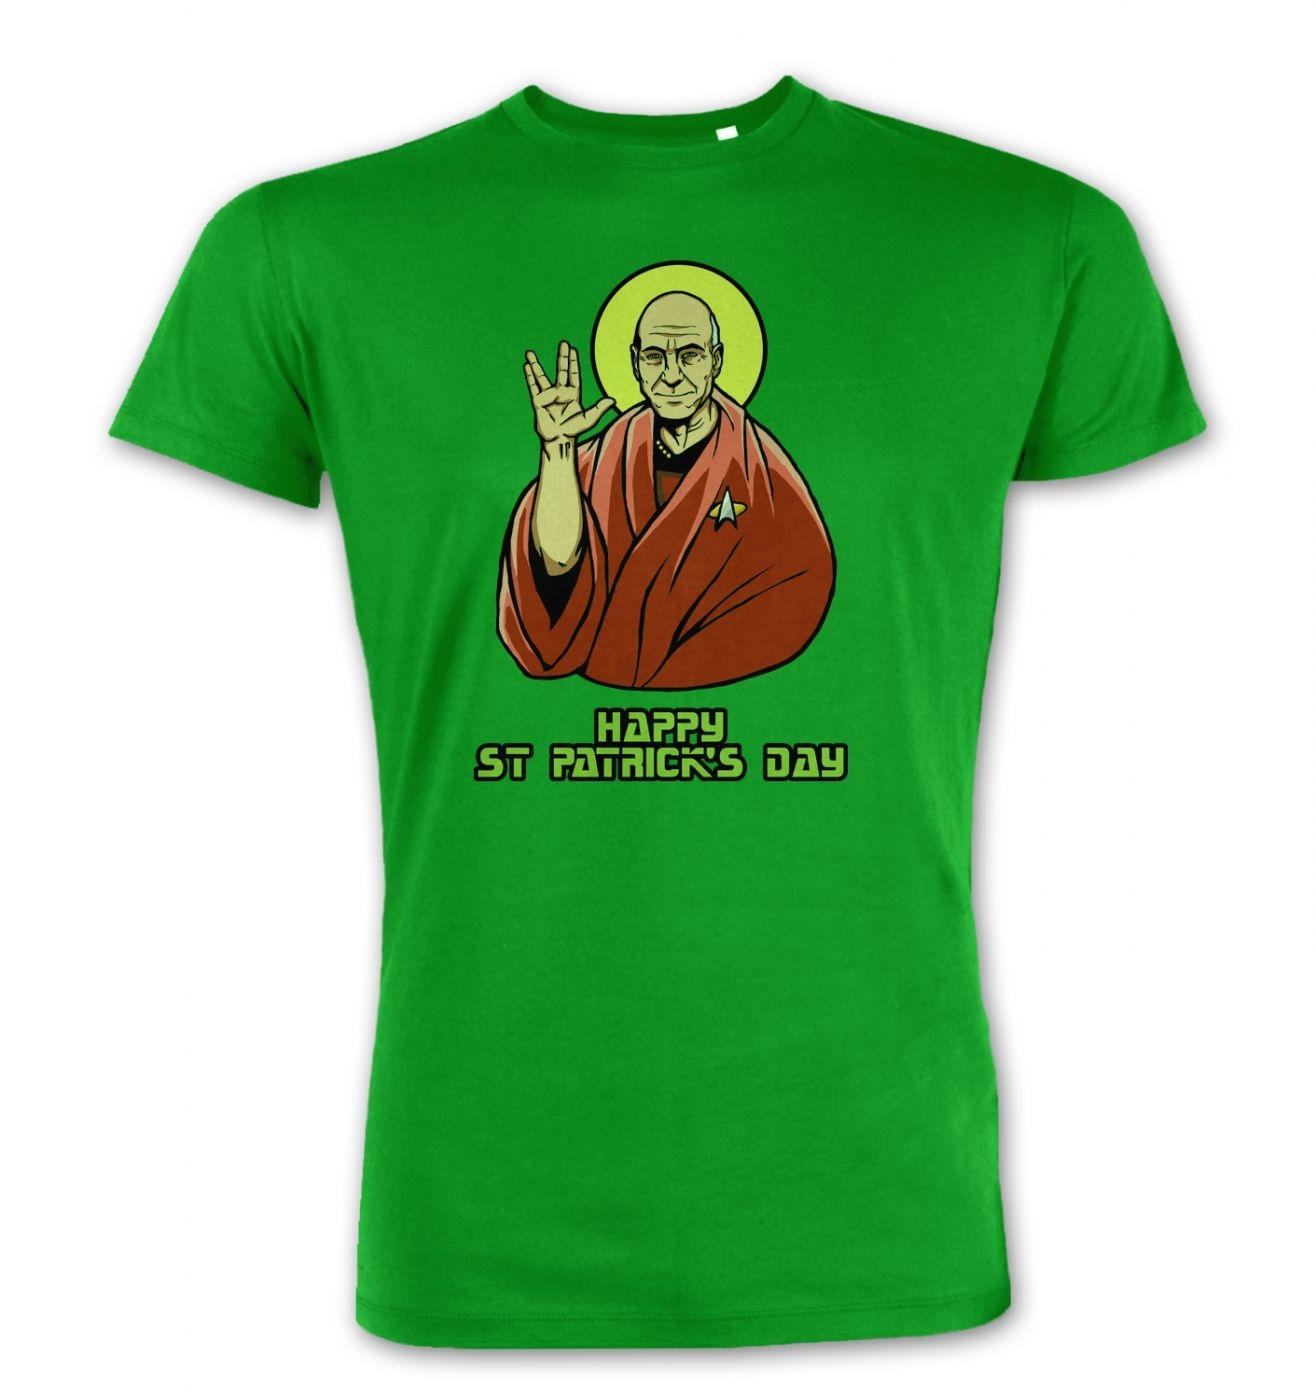 St. Patrick's premium t-shirt